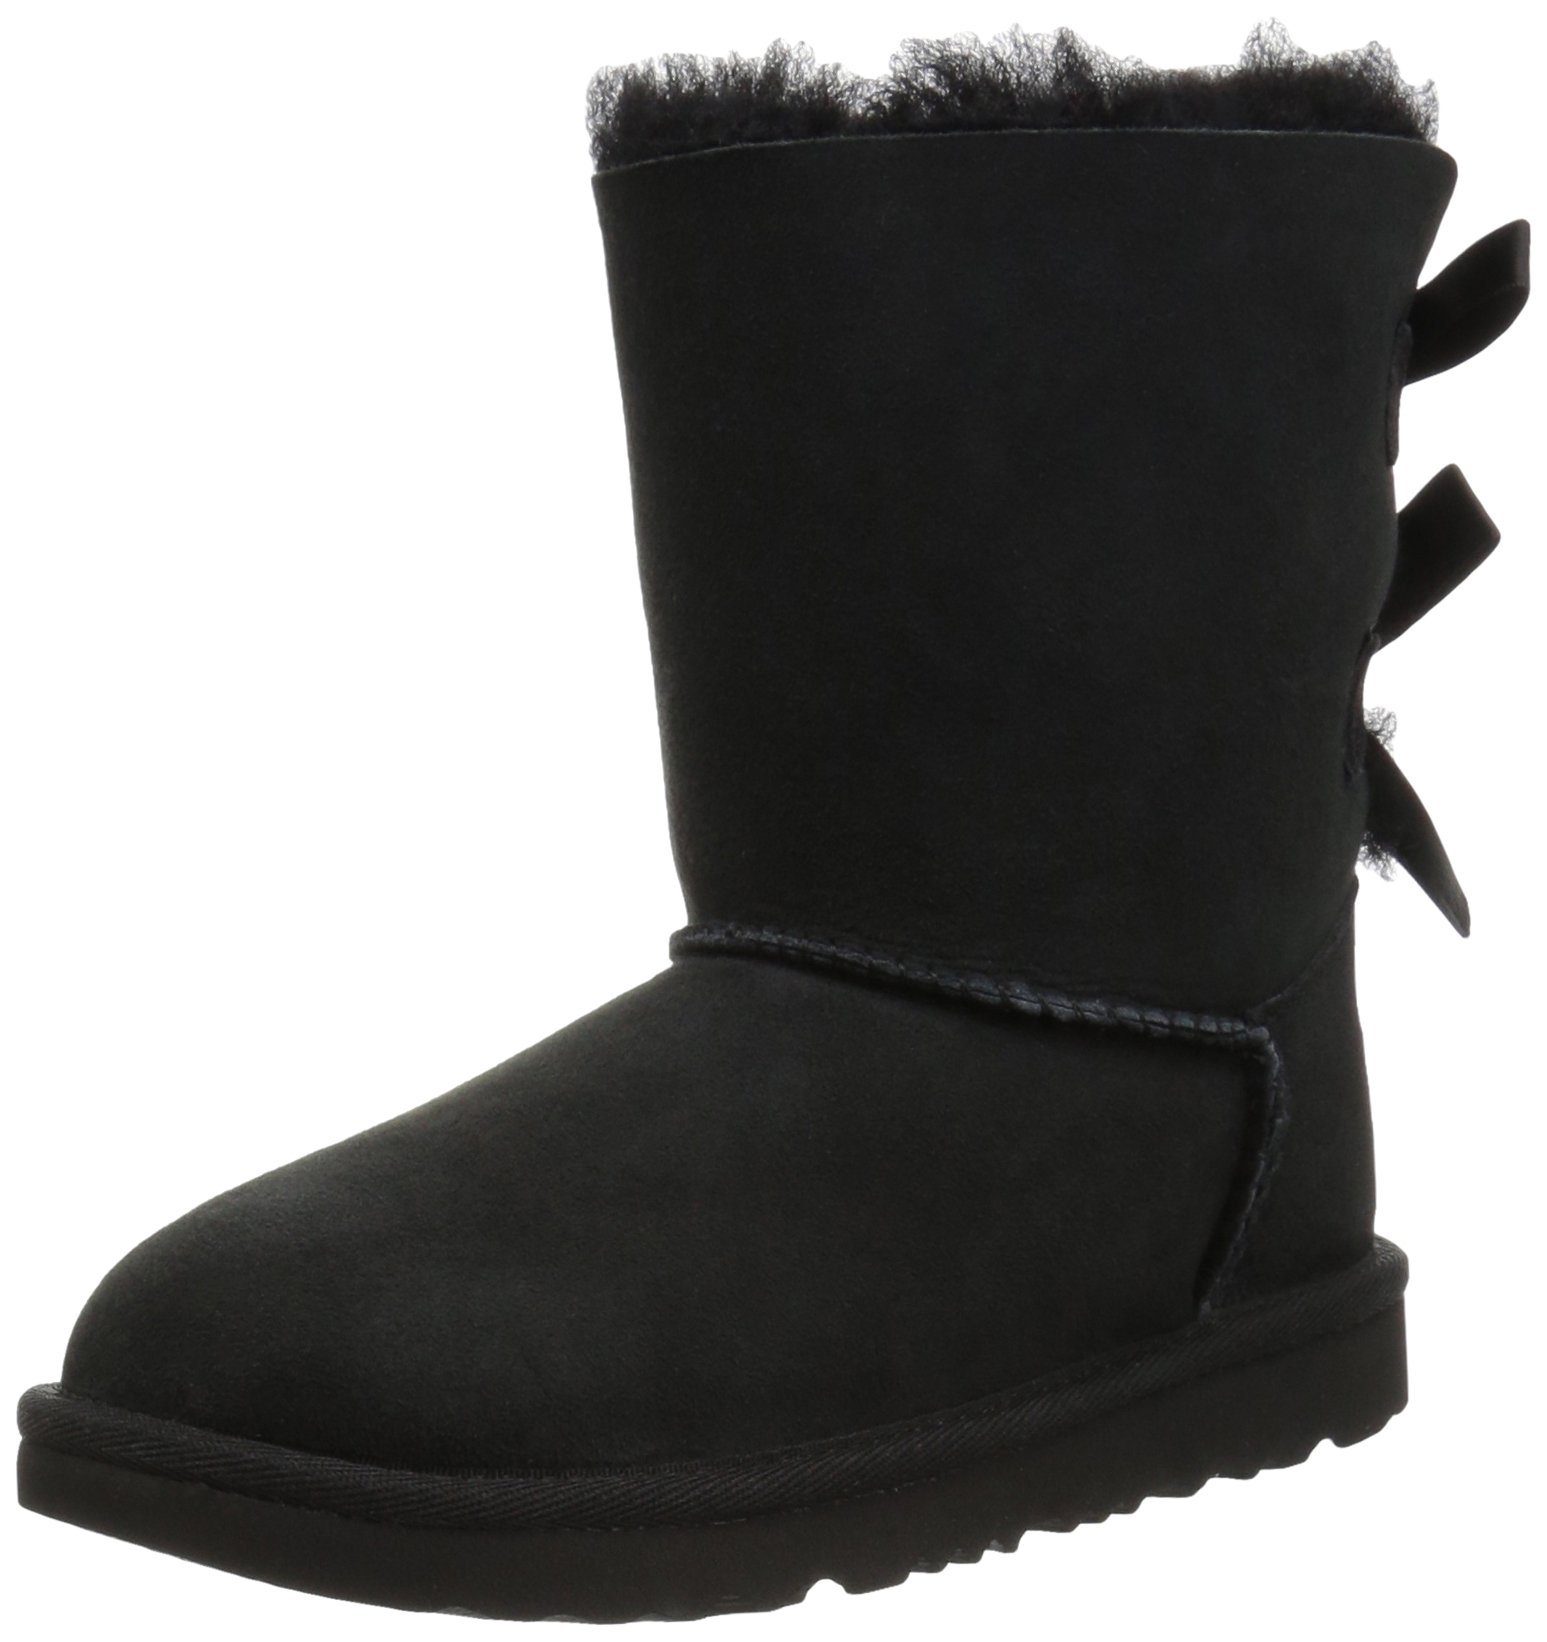 UGG Girls K Bailey Bow II Fashion Boot, Black, 1 M US Little Kid